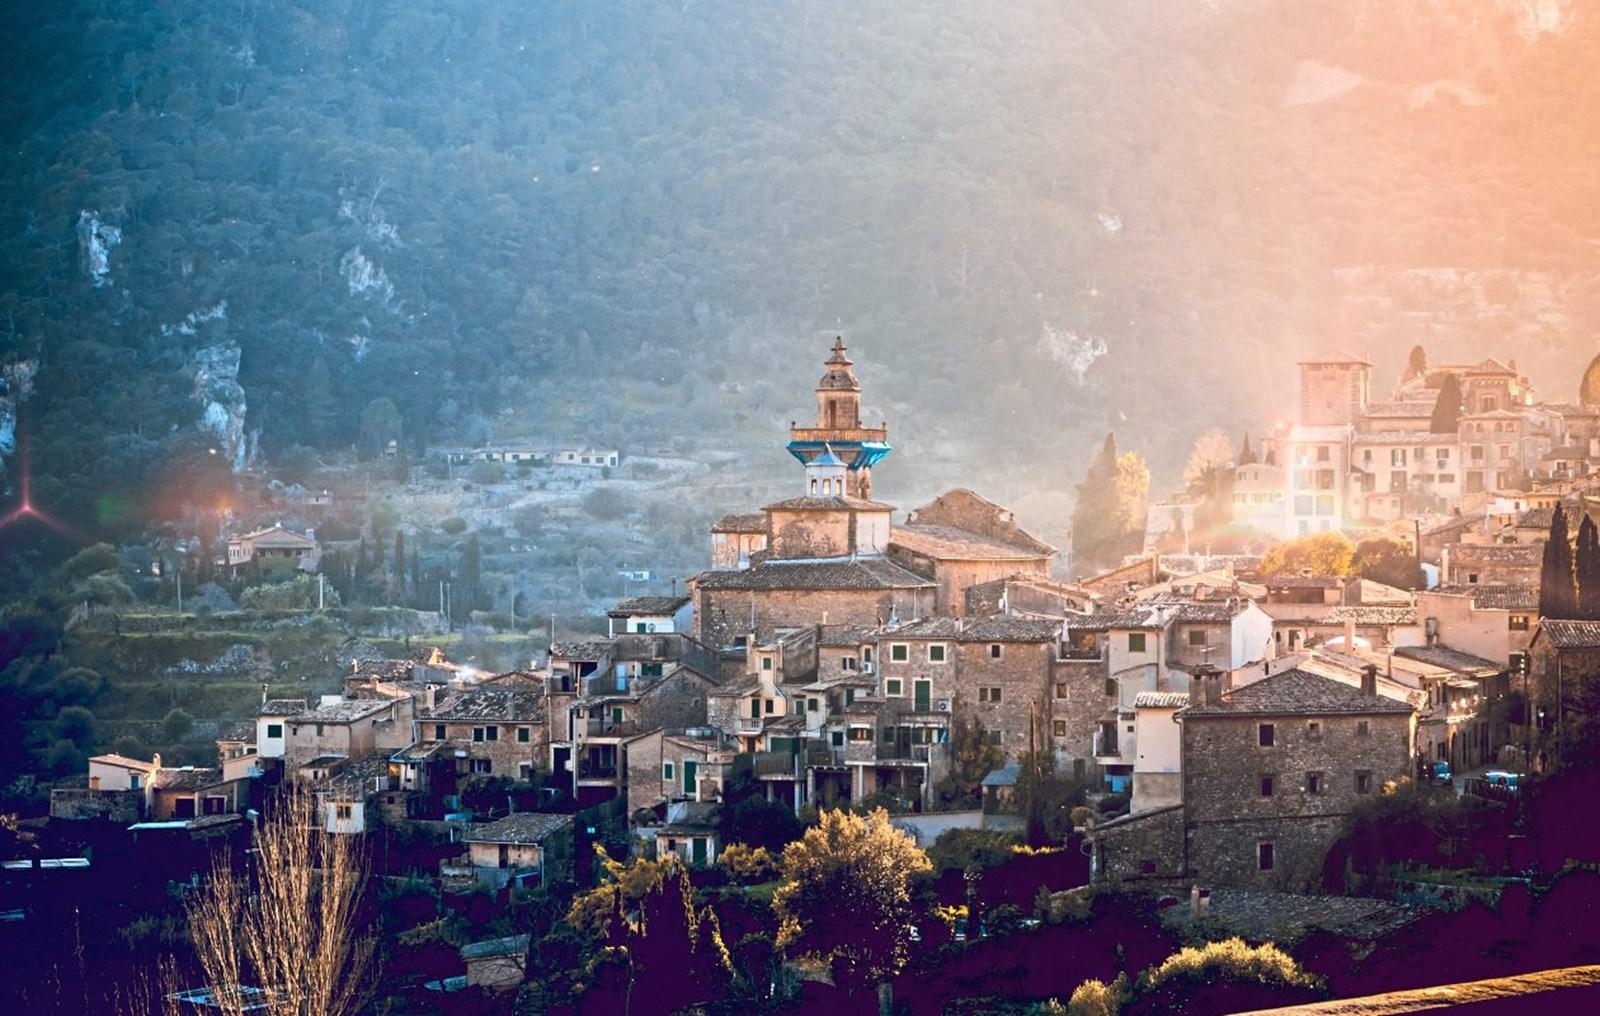 Overtourism auf Mallorca: Buhrufe vom Ballermann